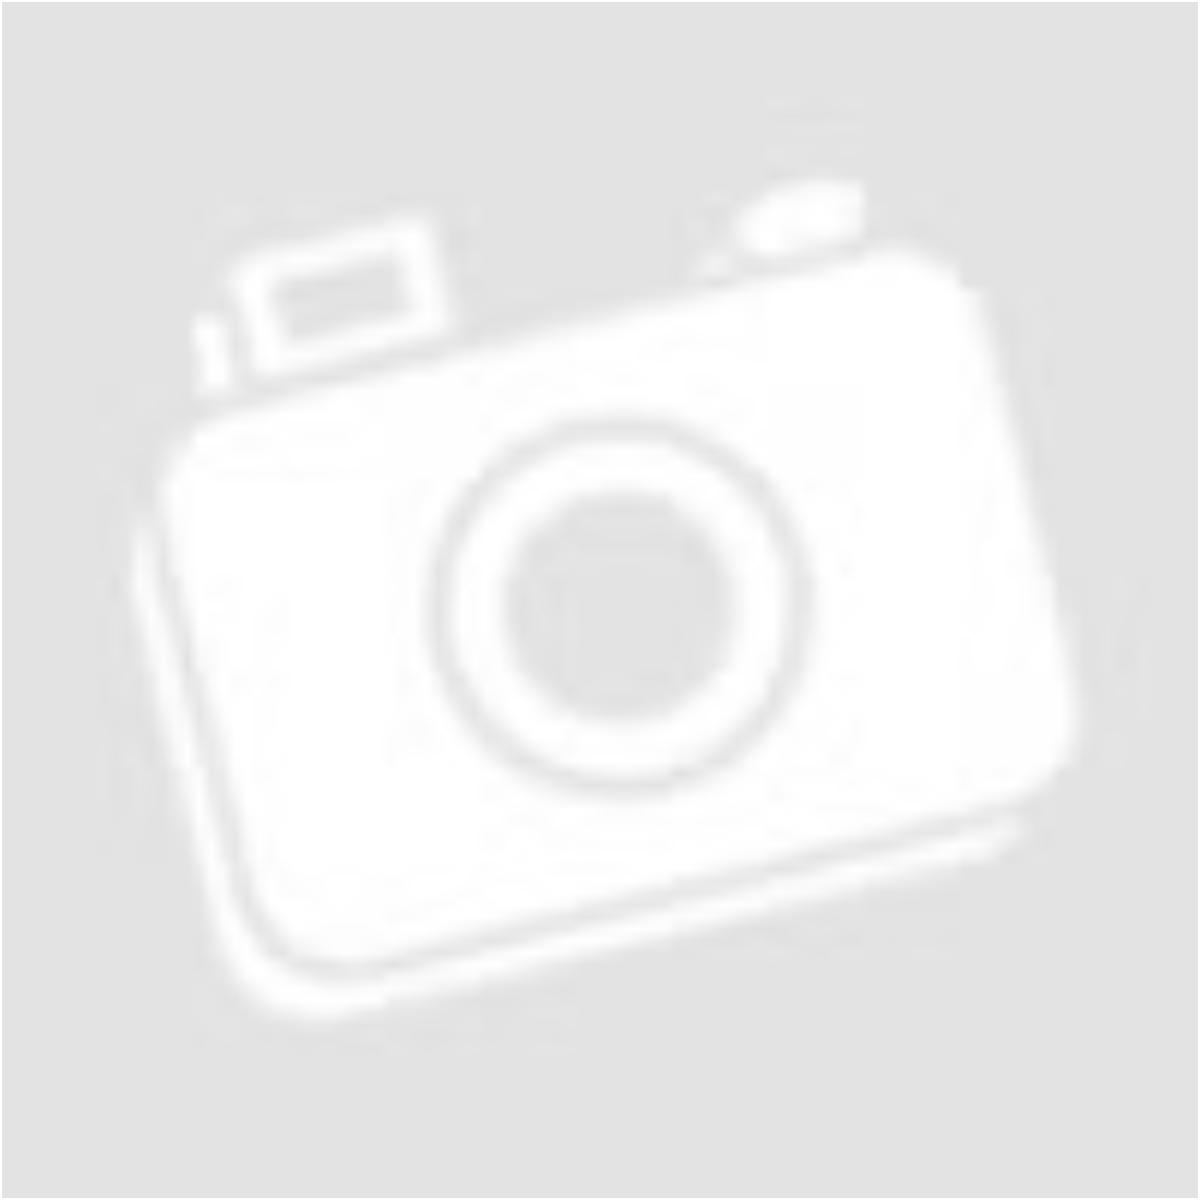 BIANCHI MAGMA 9.0 - DEORE 2X10SP kerékpár